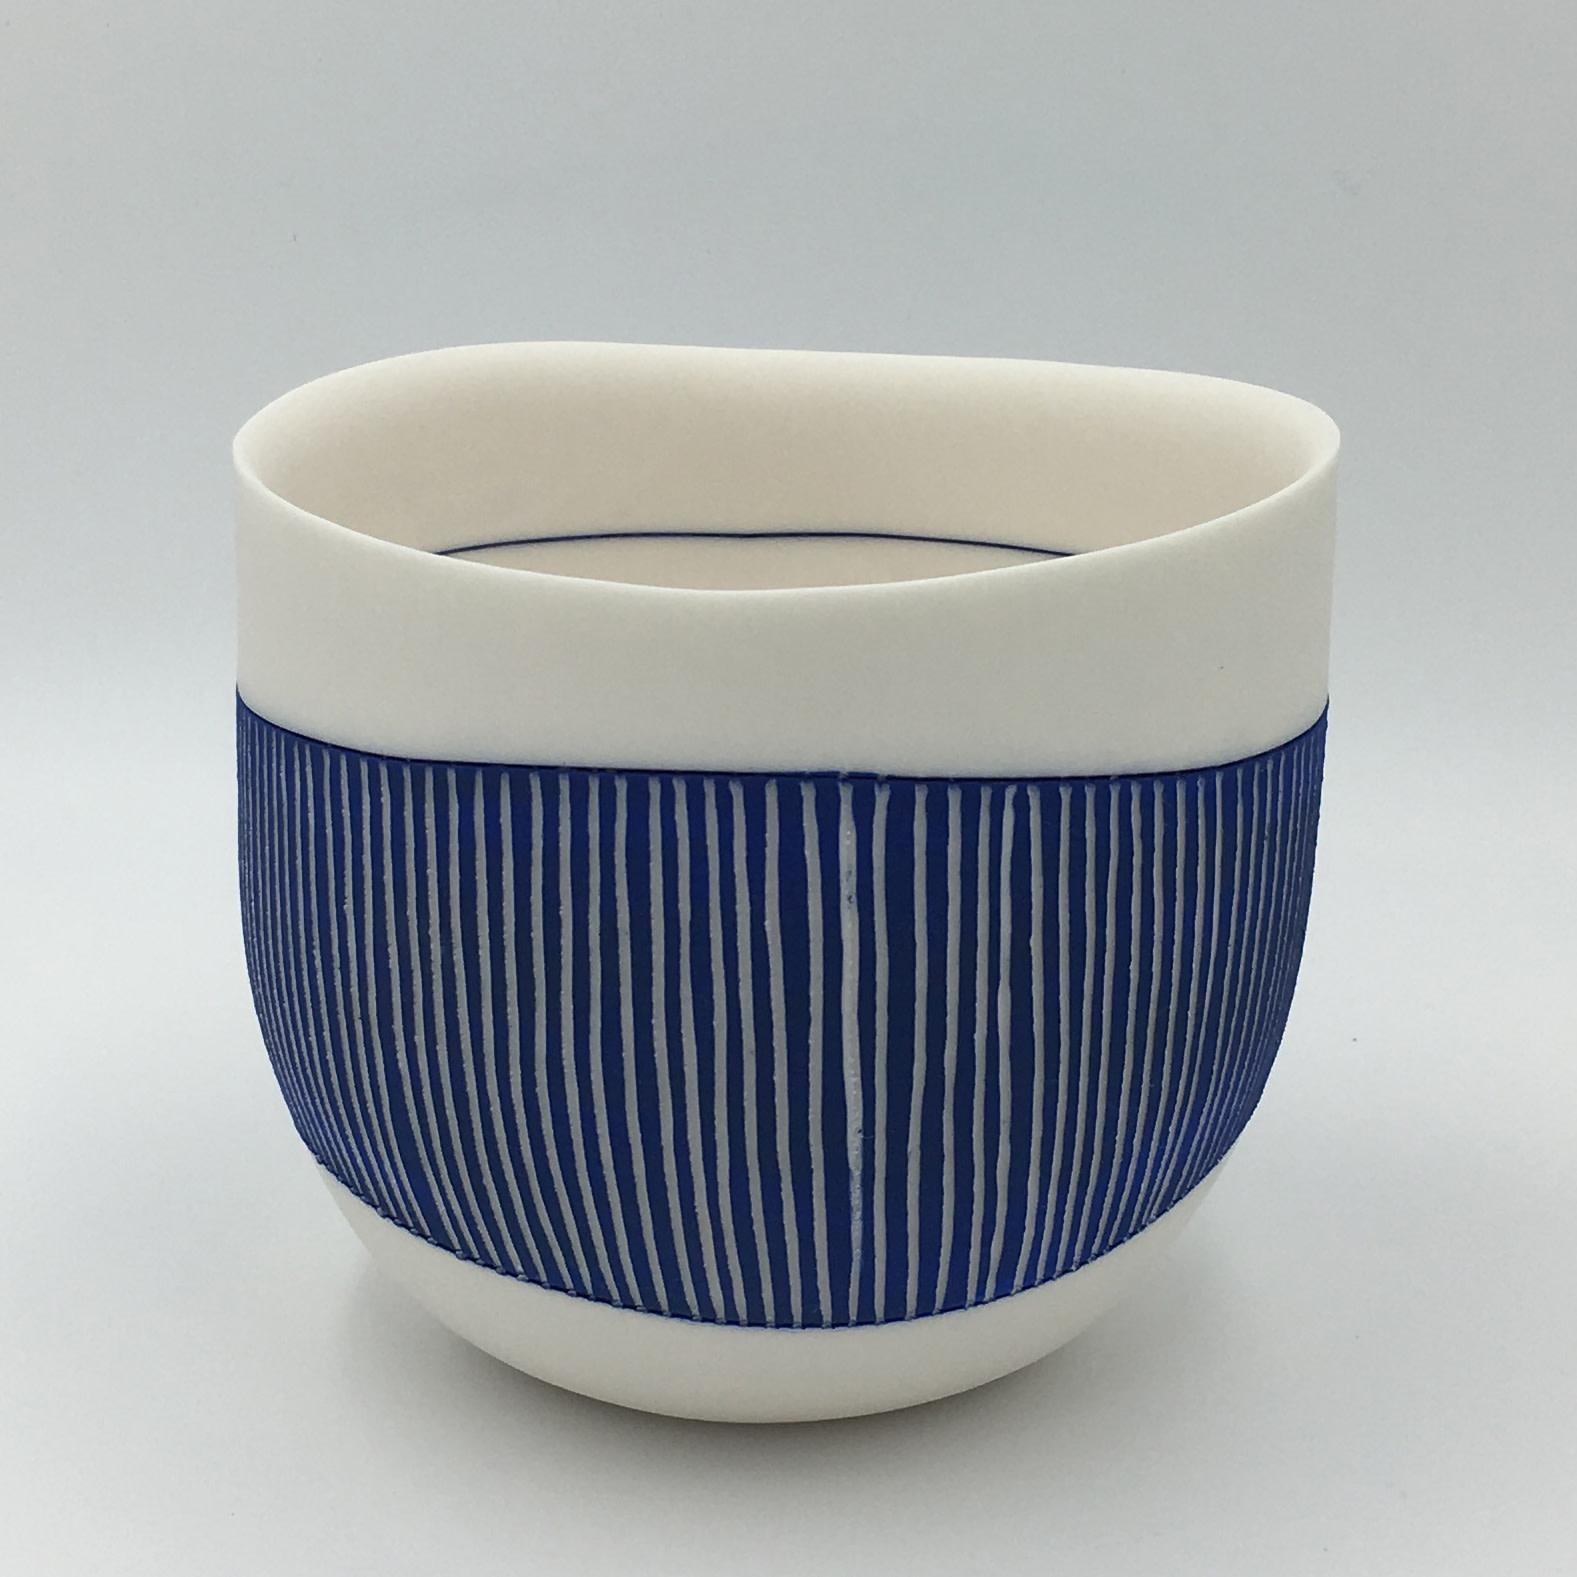 "<span class=""link fancybox-details-link""><a href=""/artists/195-lara-scobie/works/6515-lara-scobie-bowl-with-fine-blue-stripes-2019/"">View Detail Page</a></span><div class=""artist""><strong>Lara Scobie</strong></div> <div class=""title""><em>Bowl with Fine Blue Stripes</em>, 2019</div> <div class=""medium"">Porcelain</div><div class=""copyright_line"">Own Art: £28 x 10 Months, 0% APR</div>"